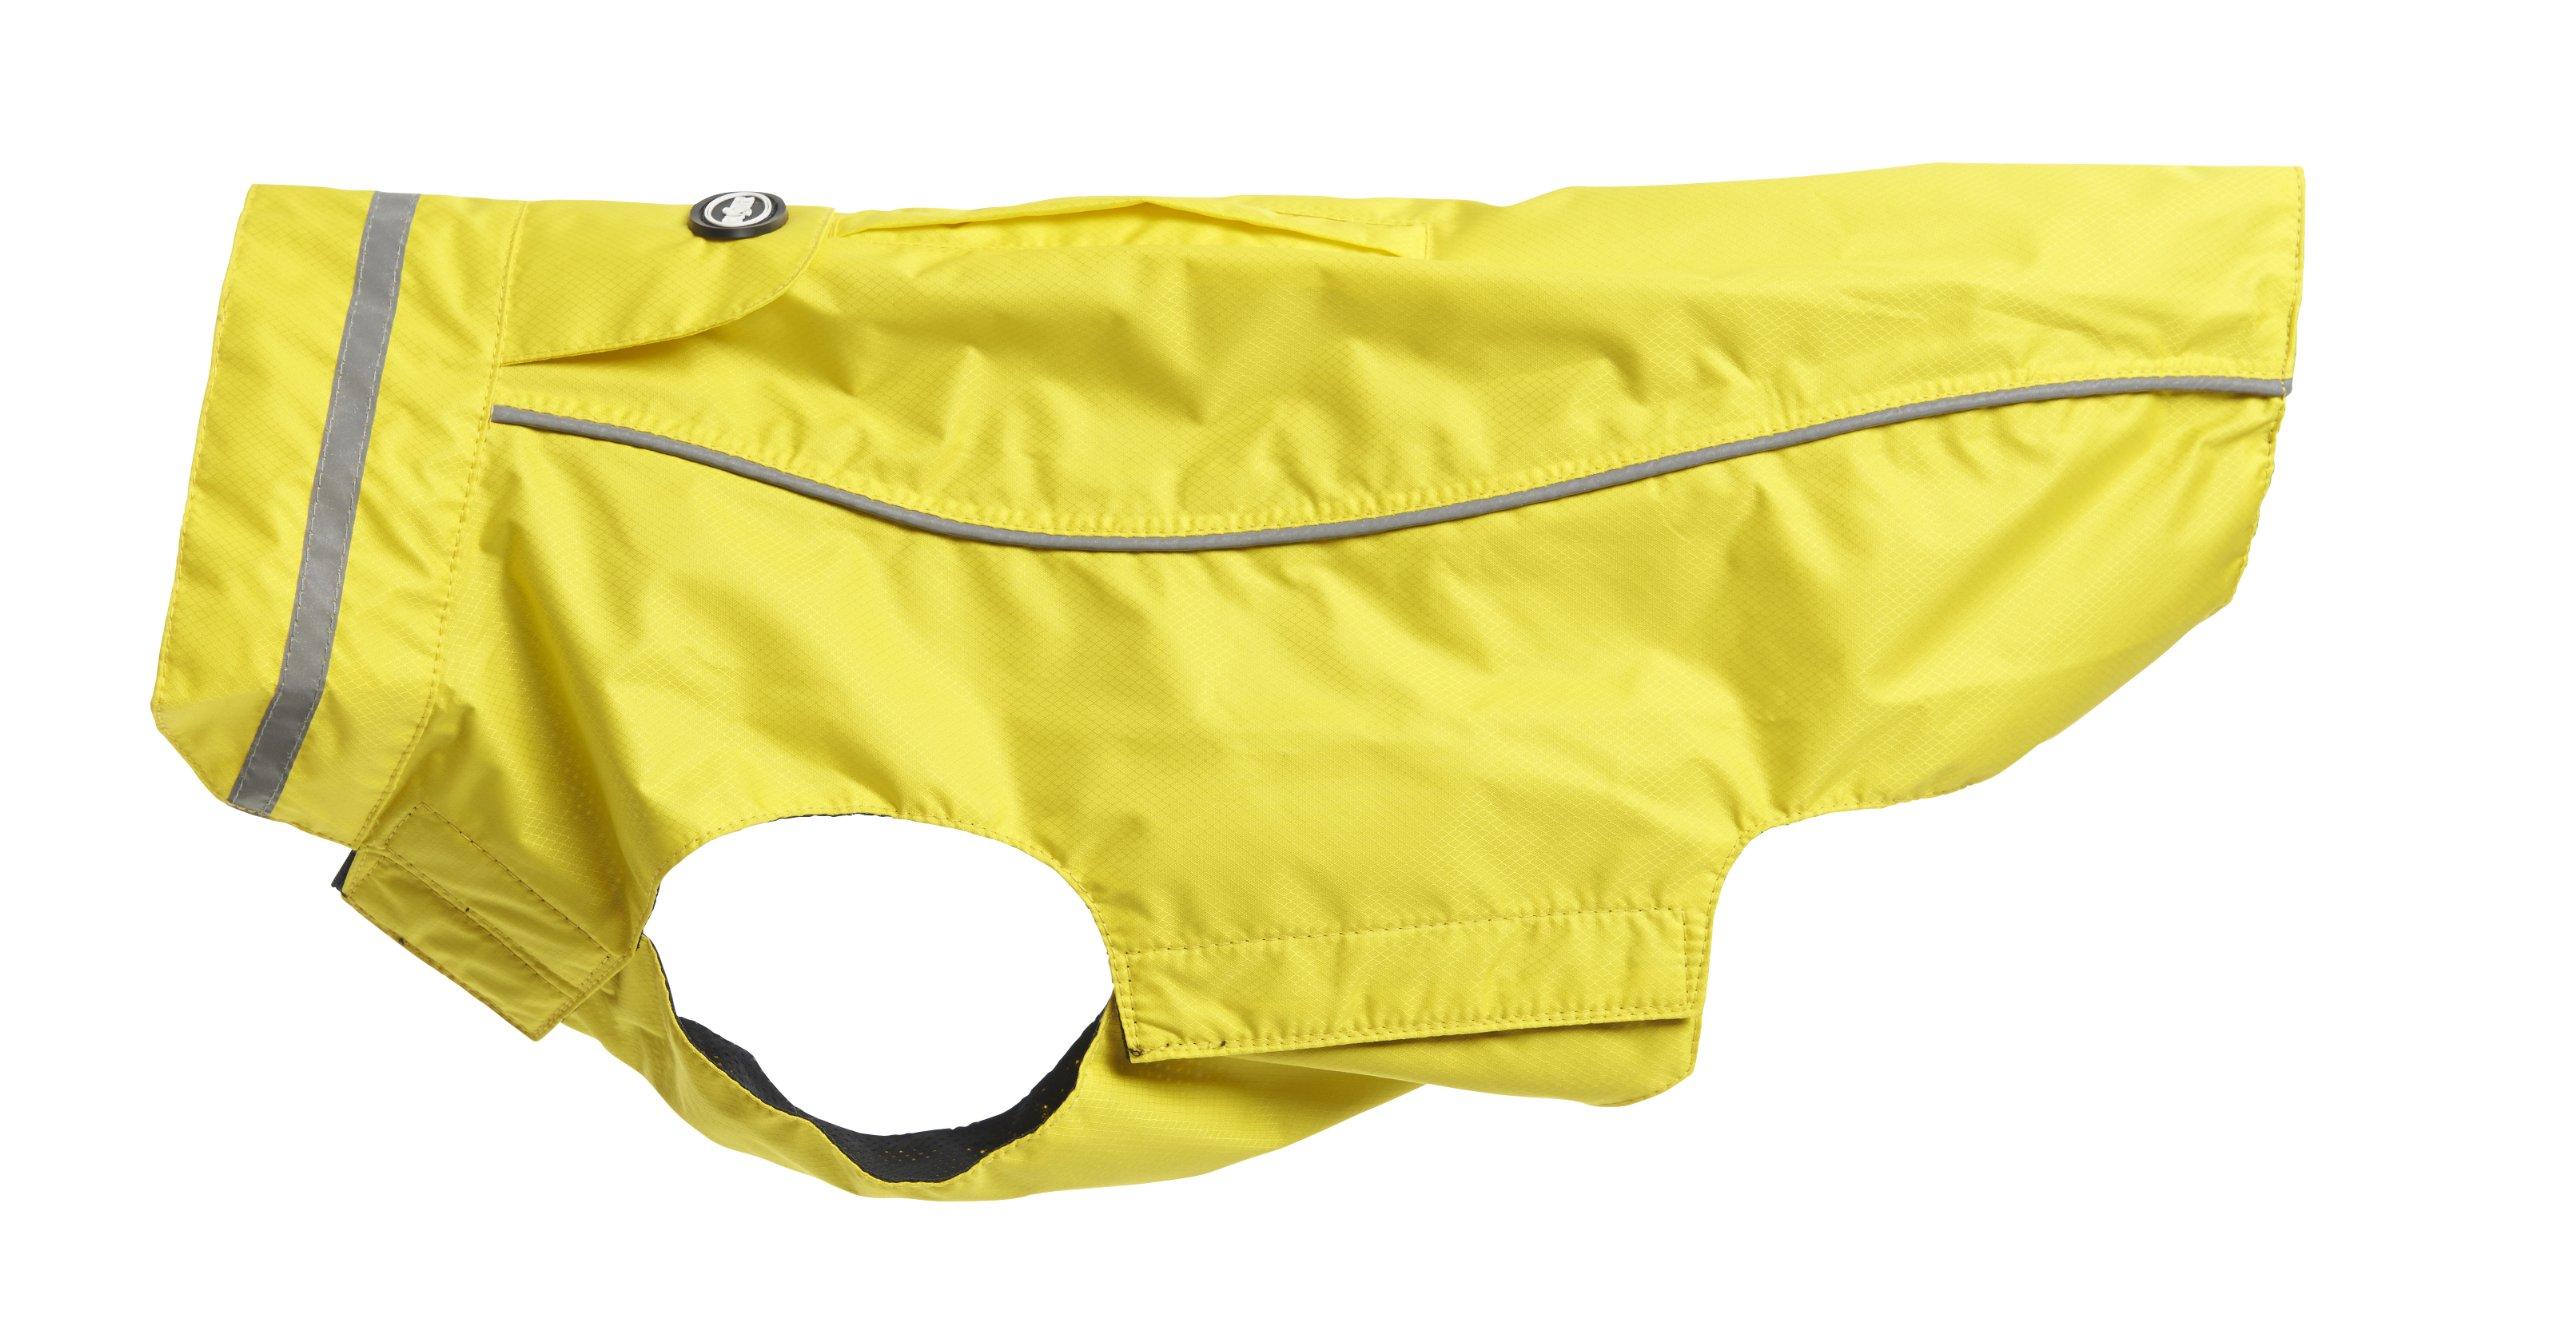 Kruuse Buster Lemon Raincoat, Large by Kruuse